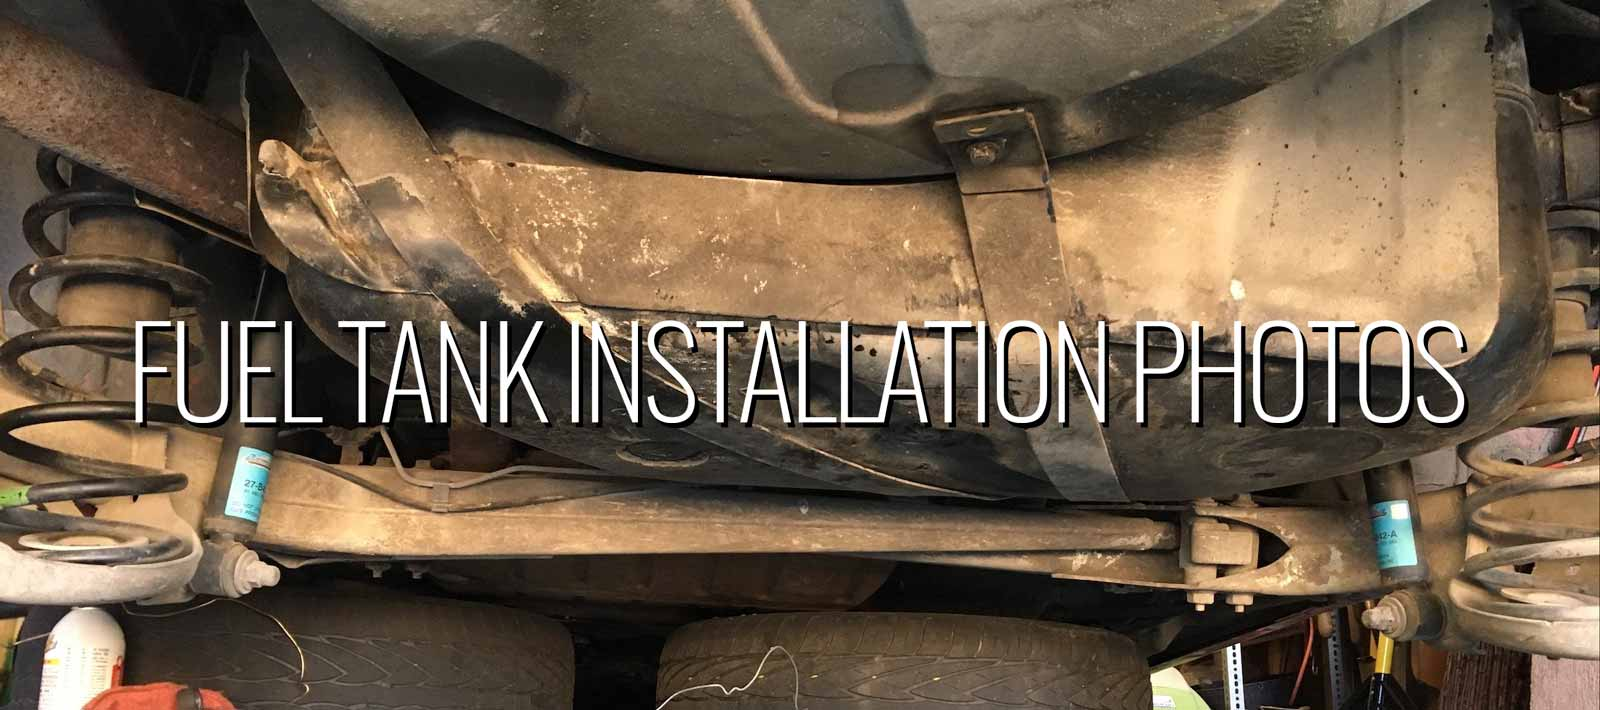 Installation Photos Fuel Tank 1994 850 -